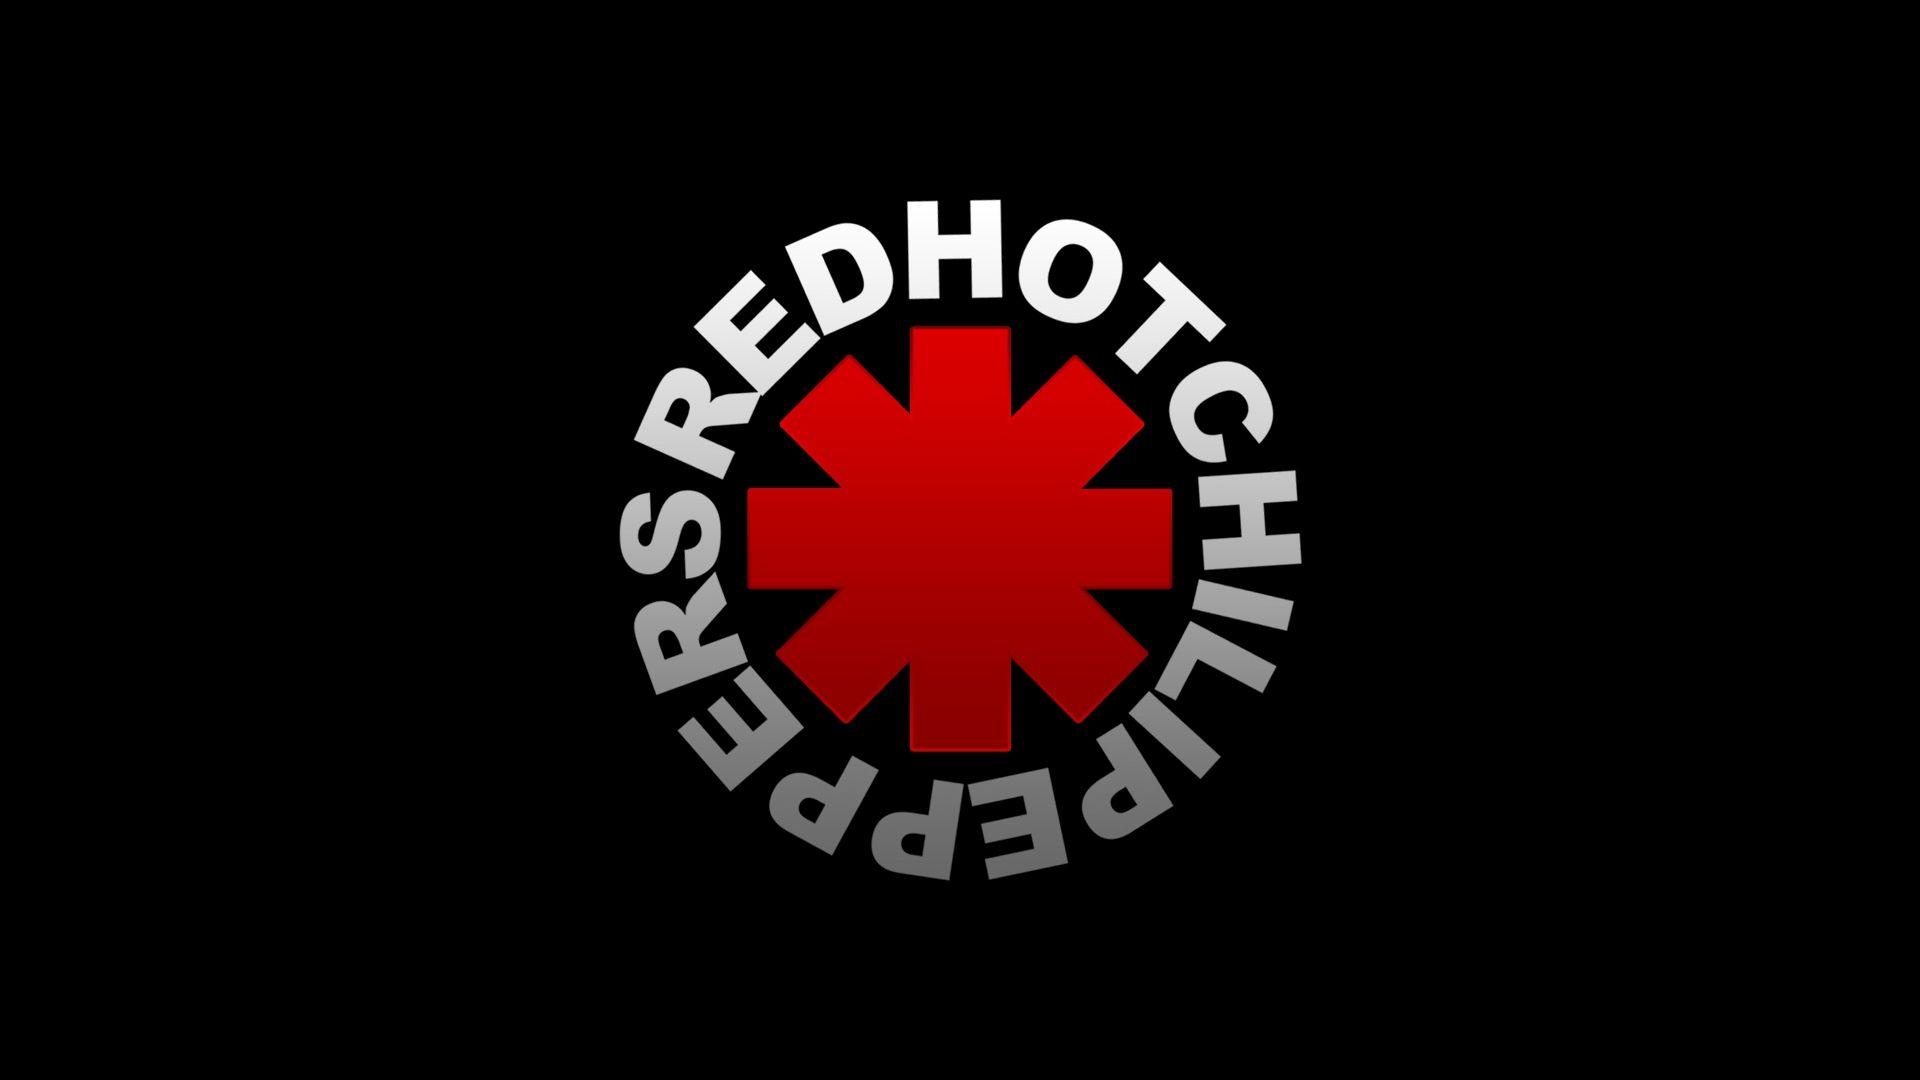 Red Hot Chili Peppers Wallpapers Hd Download S Izobrazheniyami